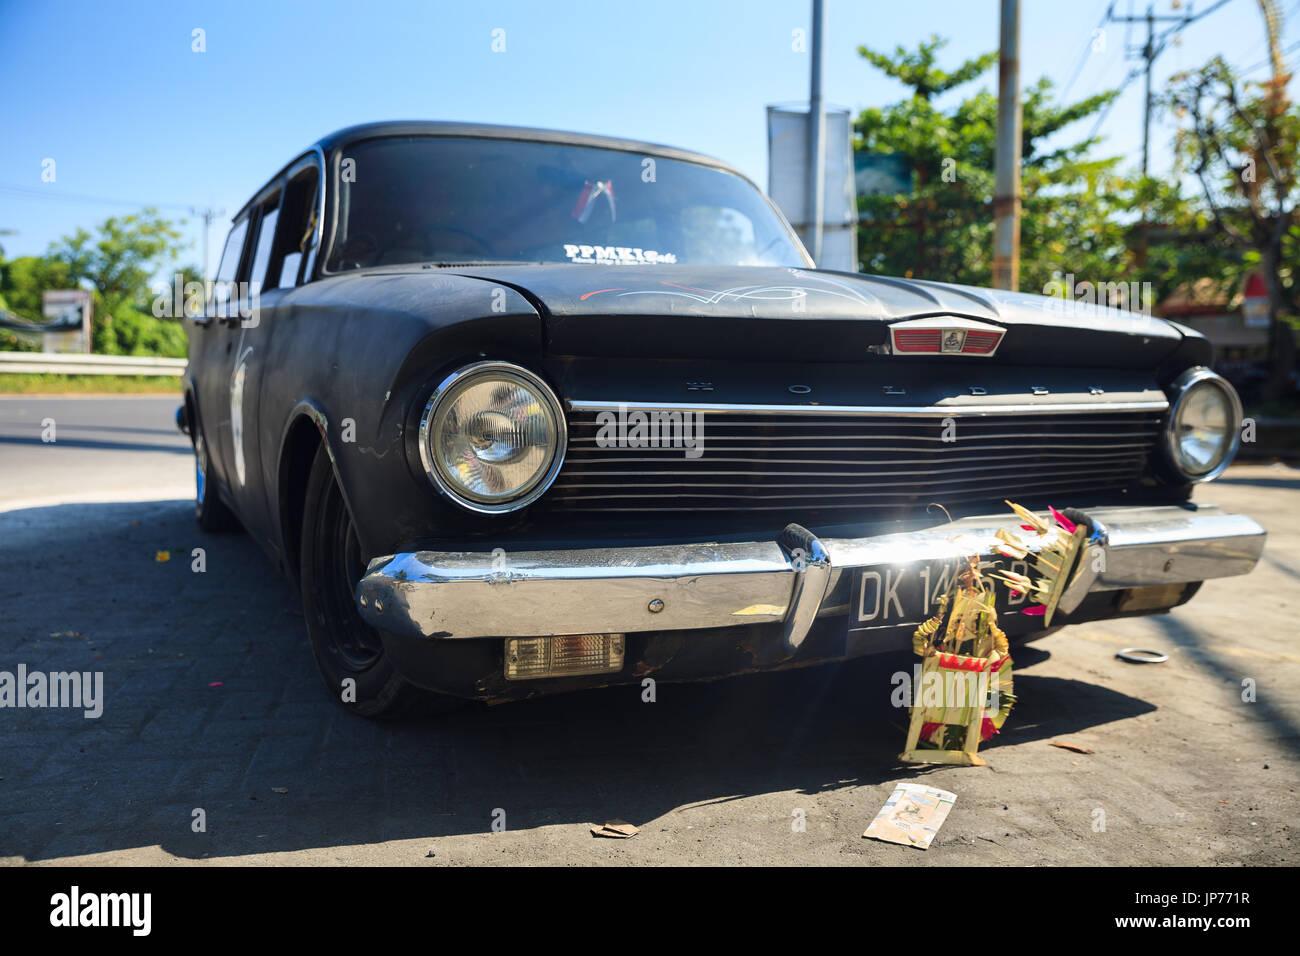 Matchless vintage car chrome